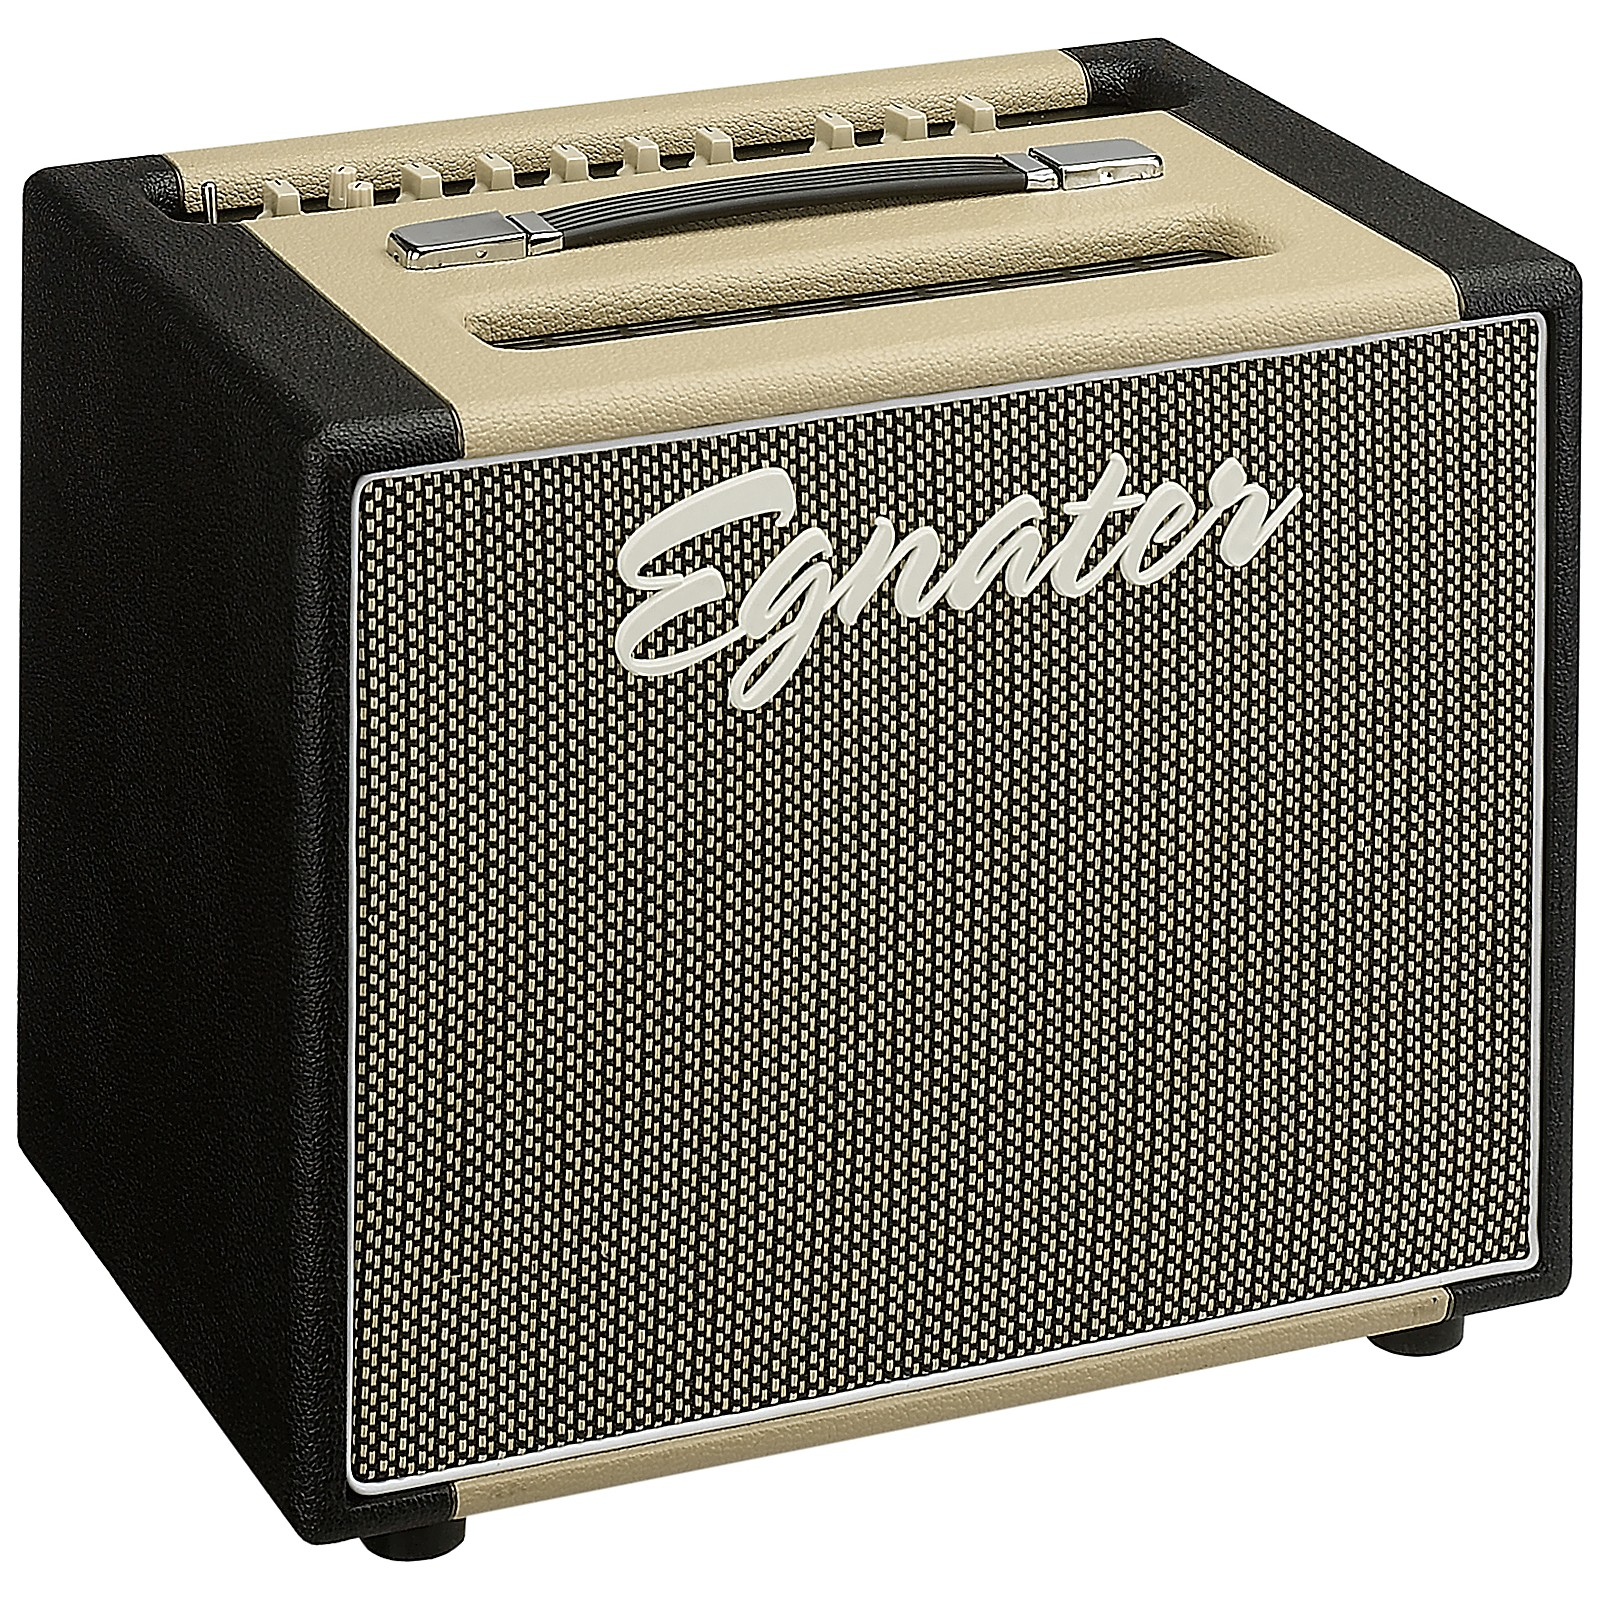 Egnater Rebel-30 112 1x12 30W Tube Combo Guitar Amp